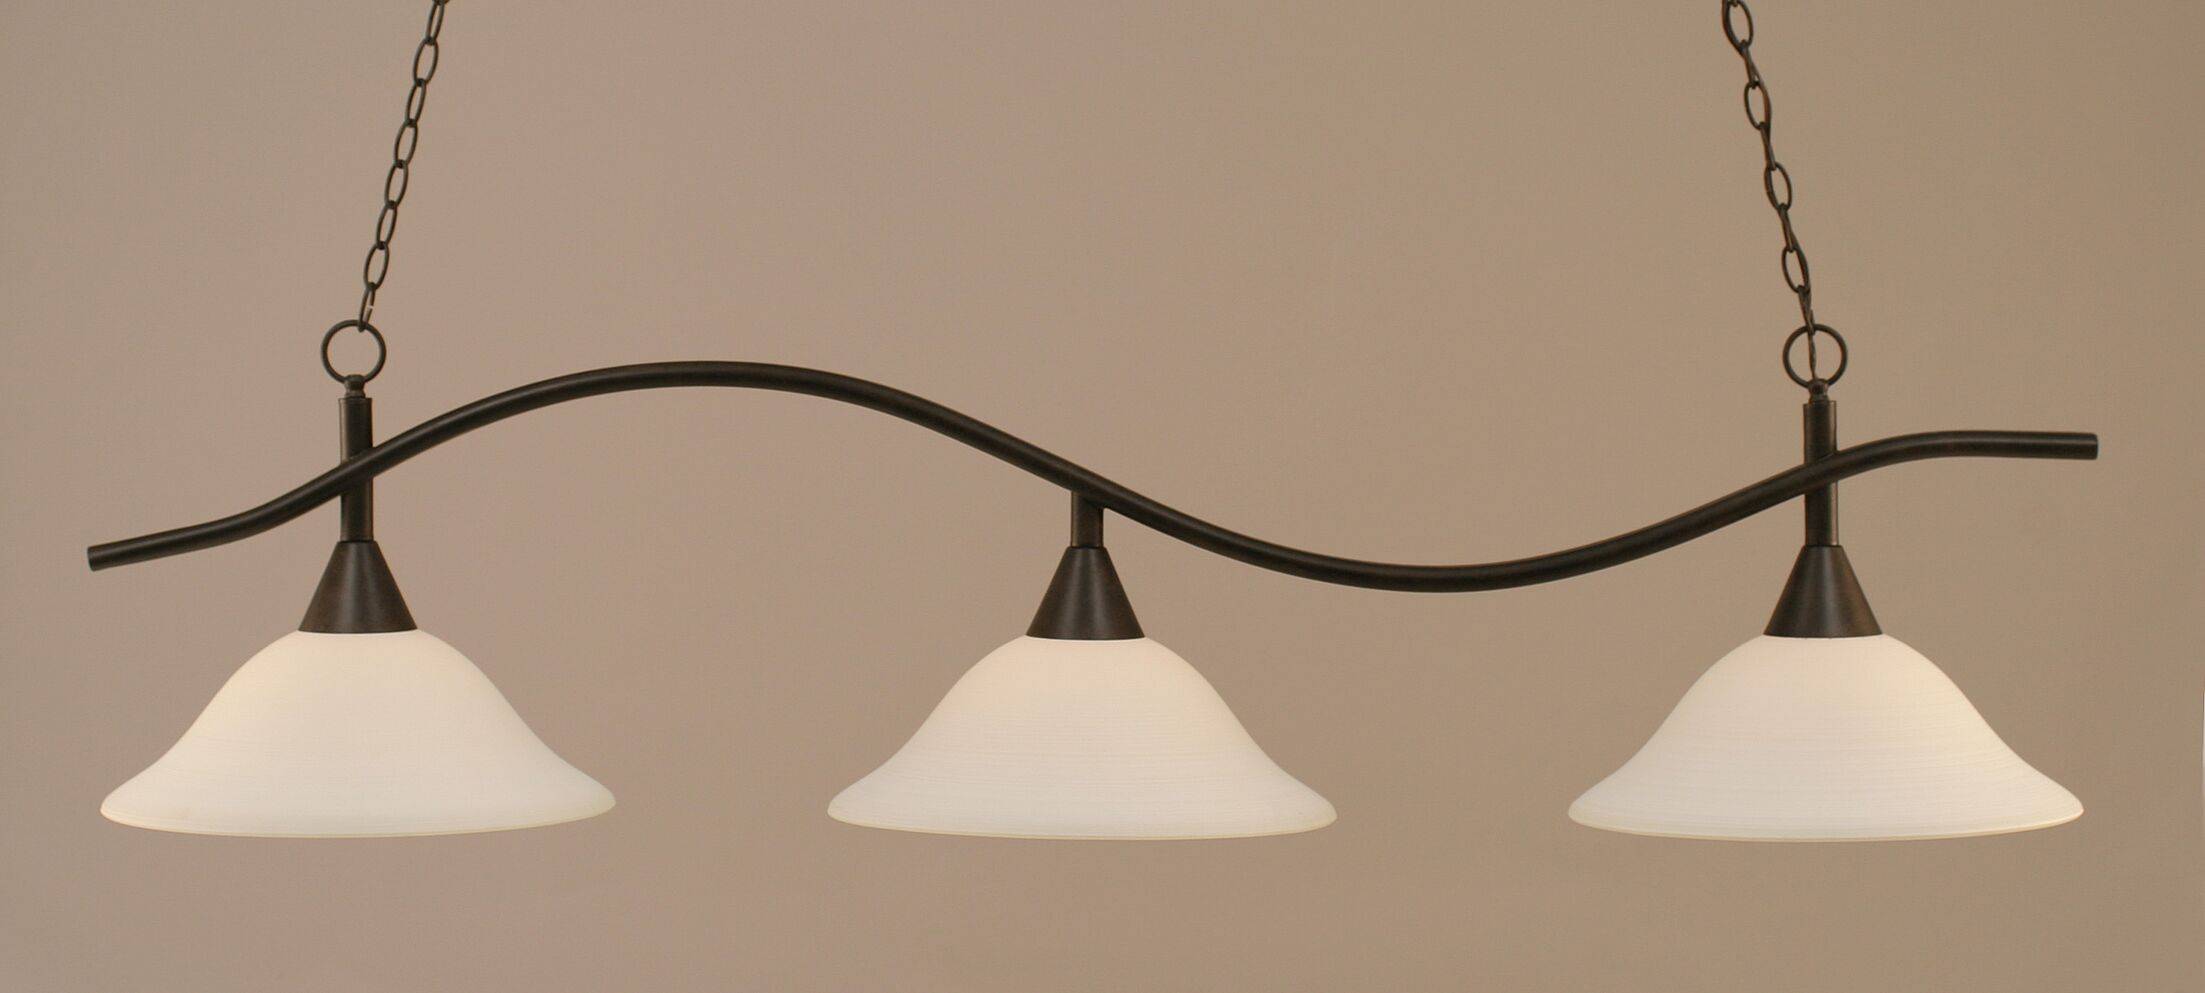 Demi 3-Light Billiard Light Finish: Dark Granite, Shade: White Linen Glass